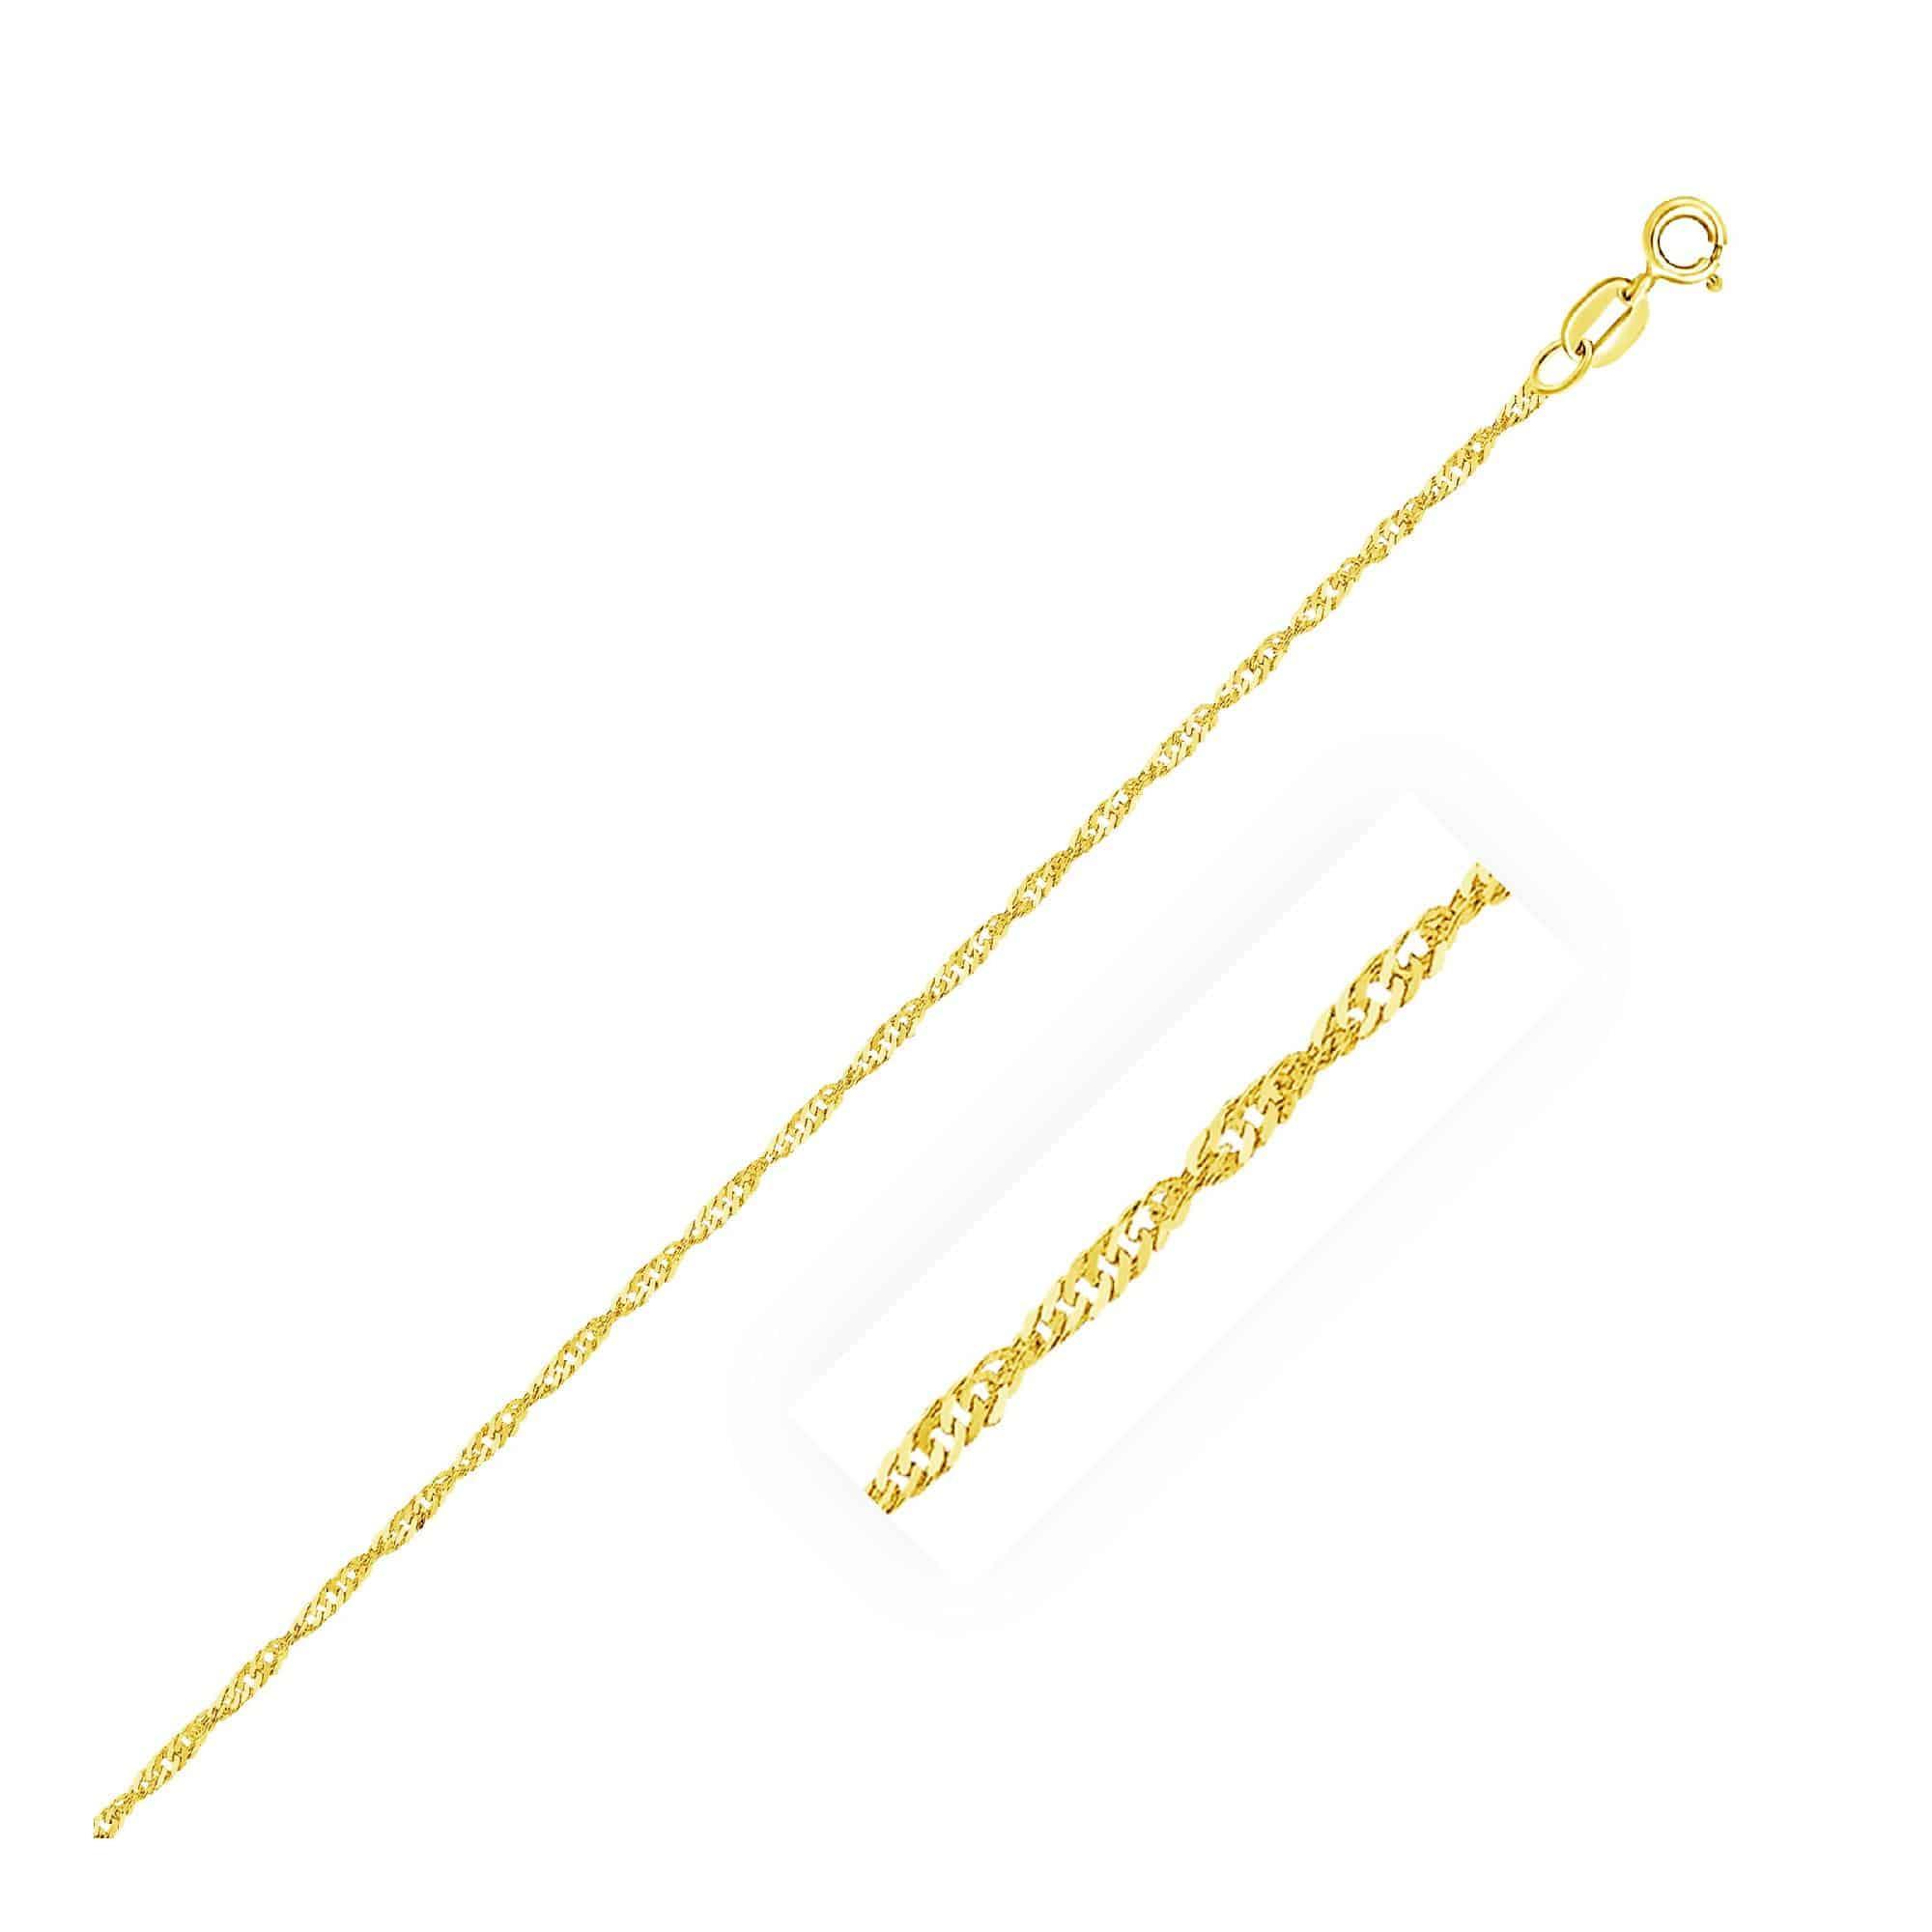 10k Yellow Gold Singapore Chain 1.5mm